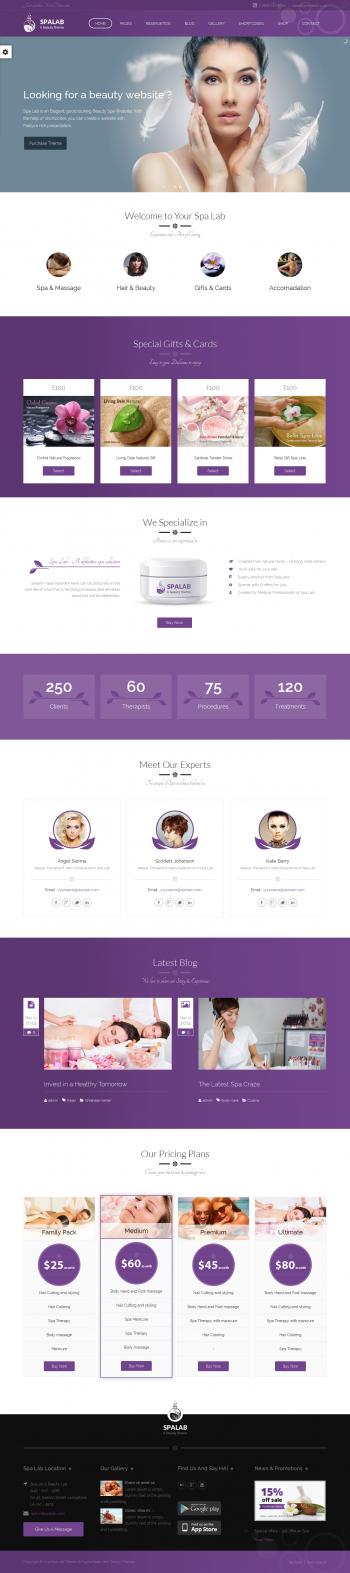 Thiết kế website thẩm mỹ viện Spa Spalab